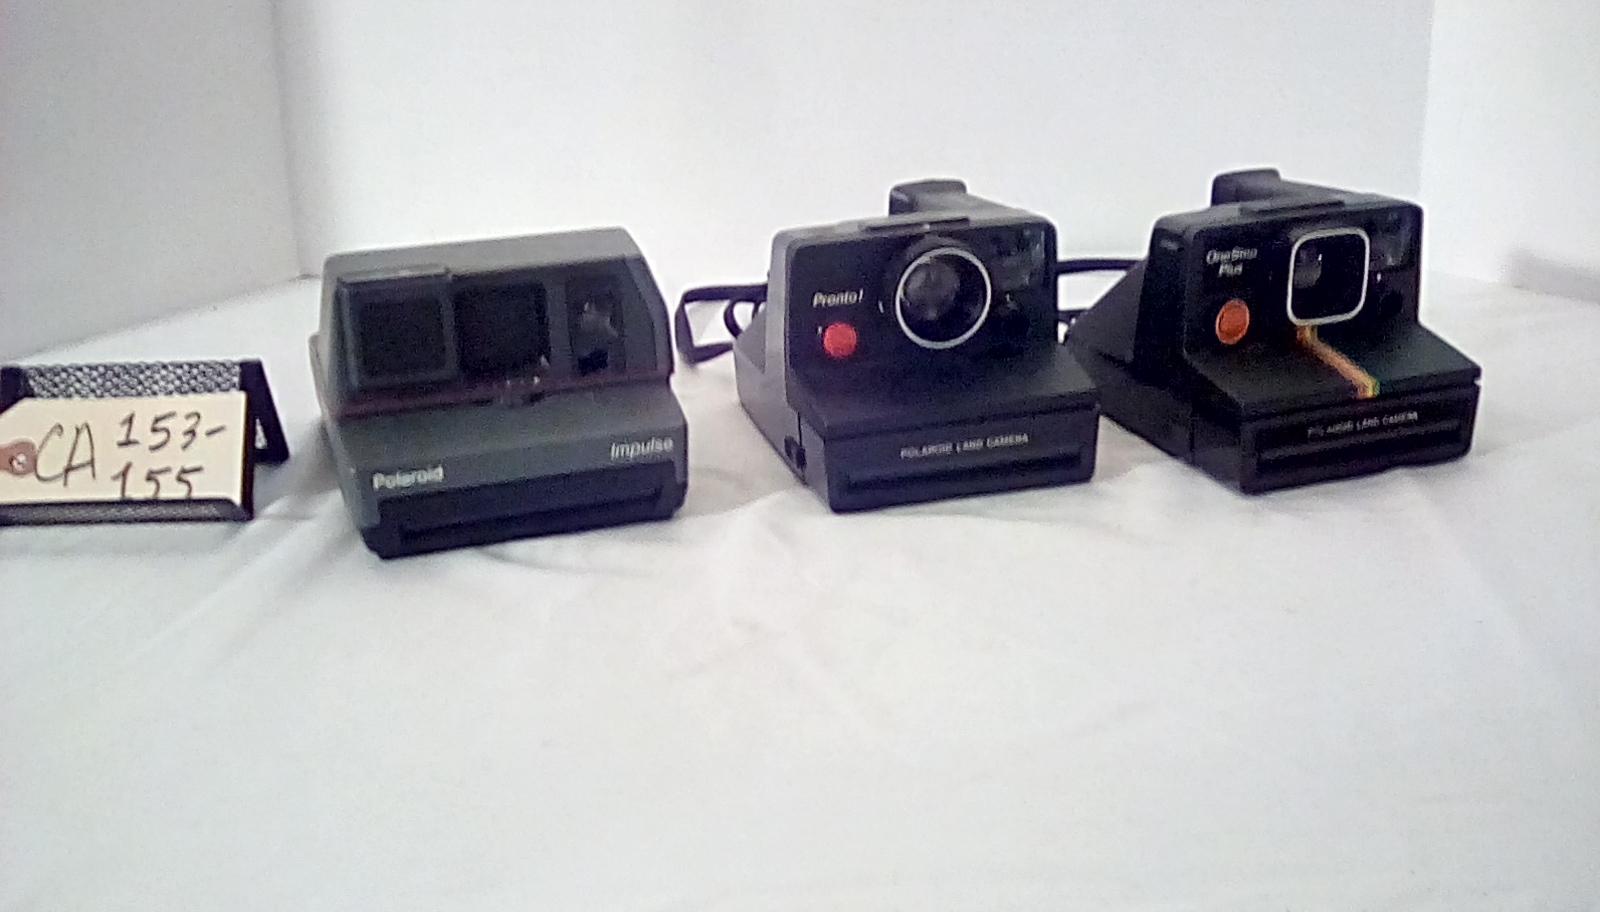 CA153 Polaroid impulse, grey w/red pinstripe, CA154 Polaroid Land camera PRONTO!, black red button to right of lens, CA155 Polaroid Land camera, 1 step plus, black, vertical rainbow stripe